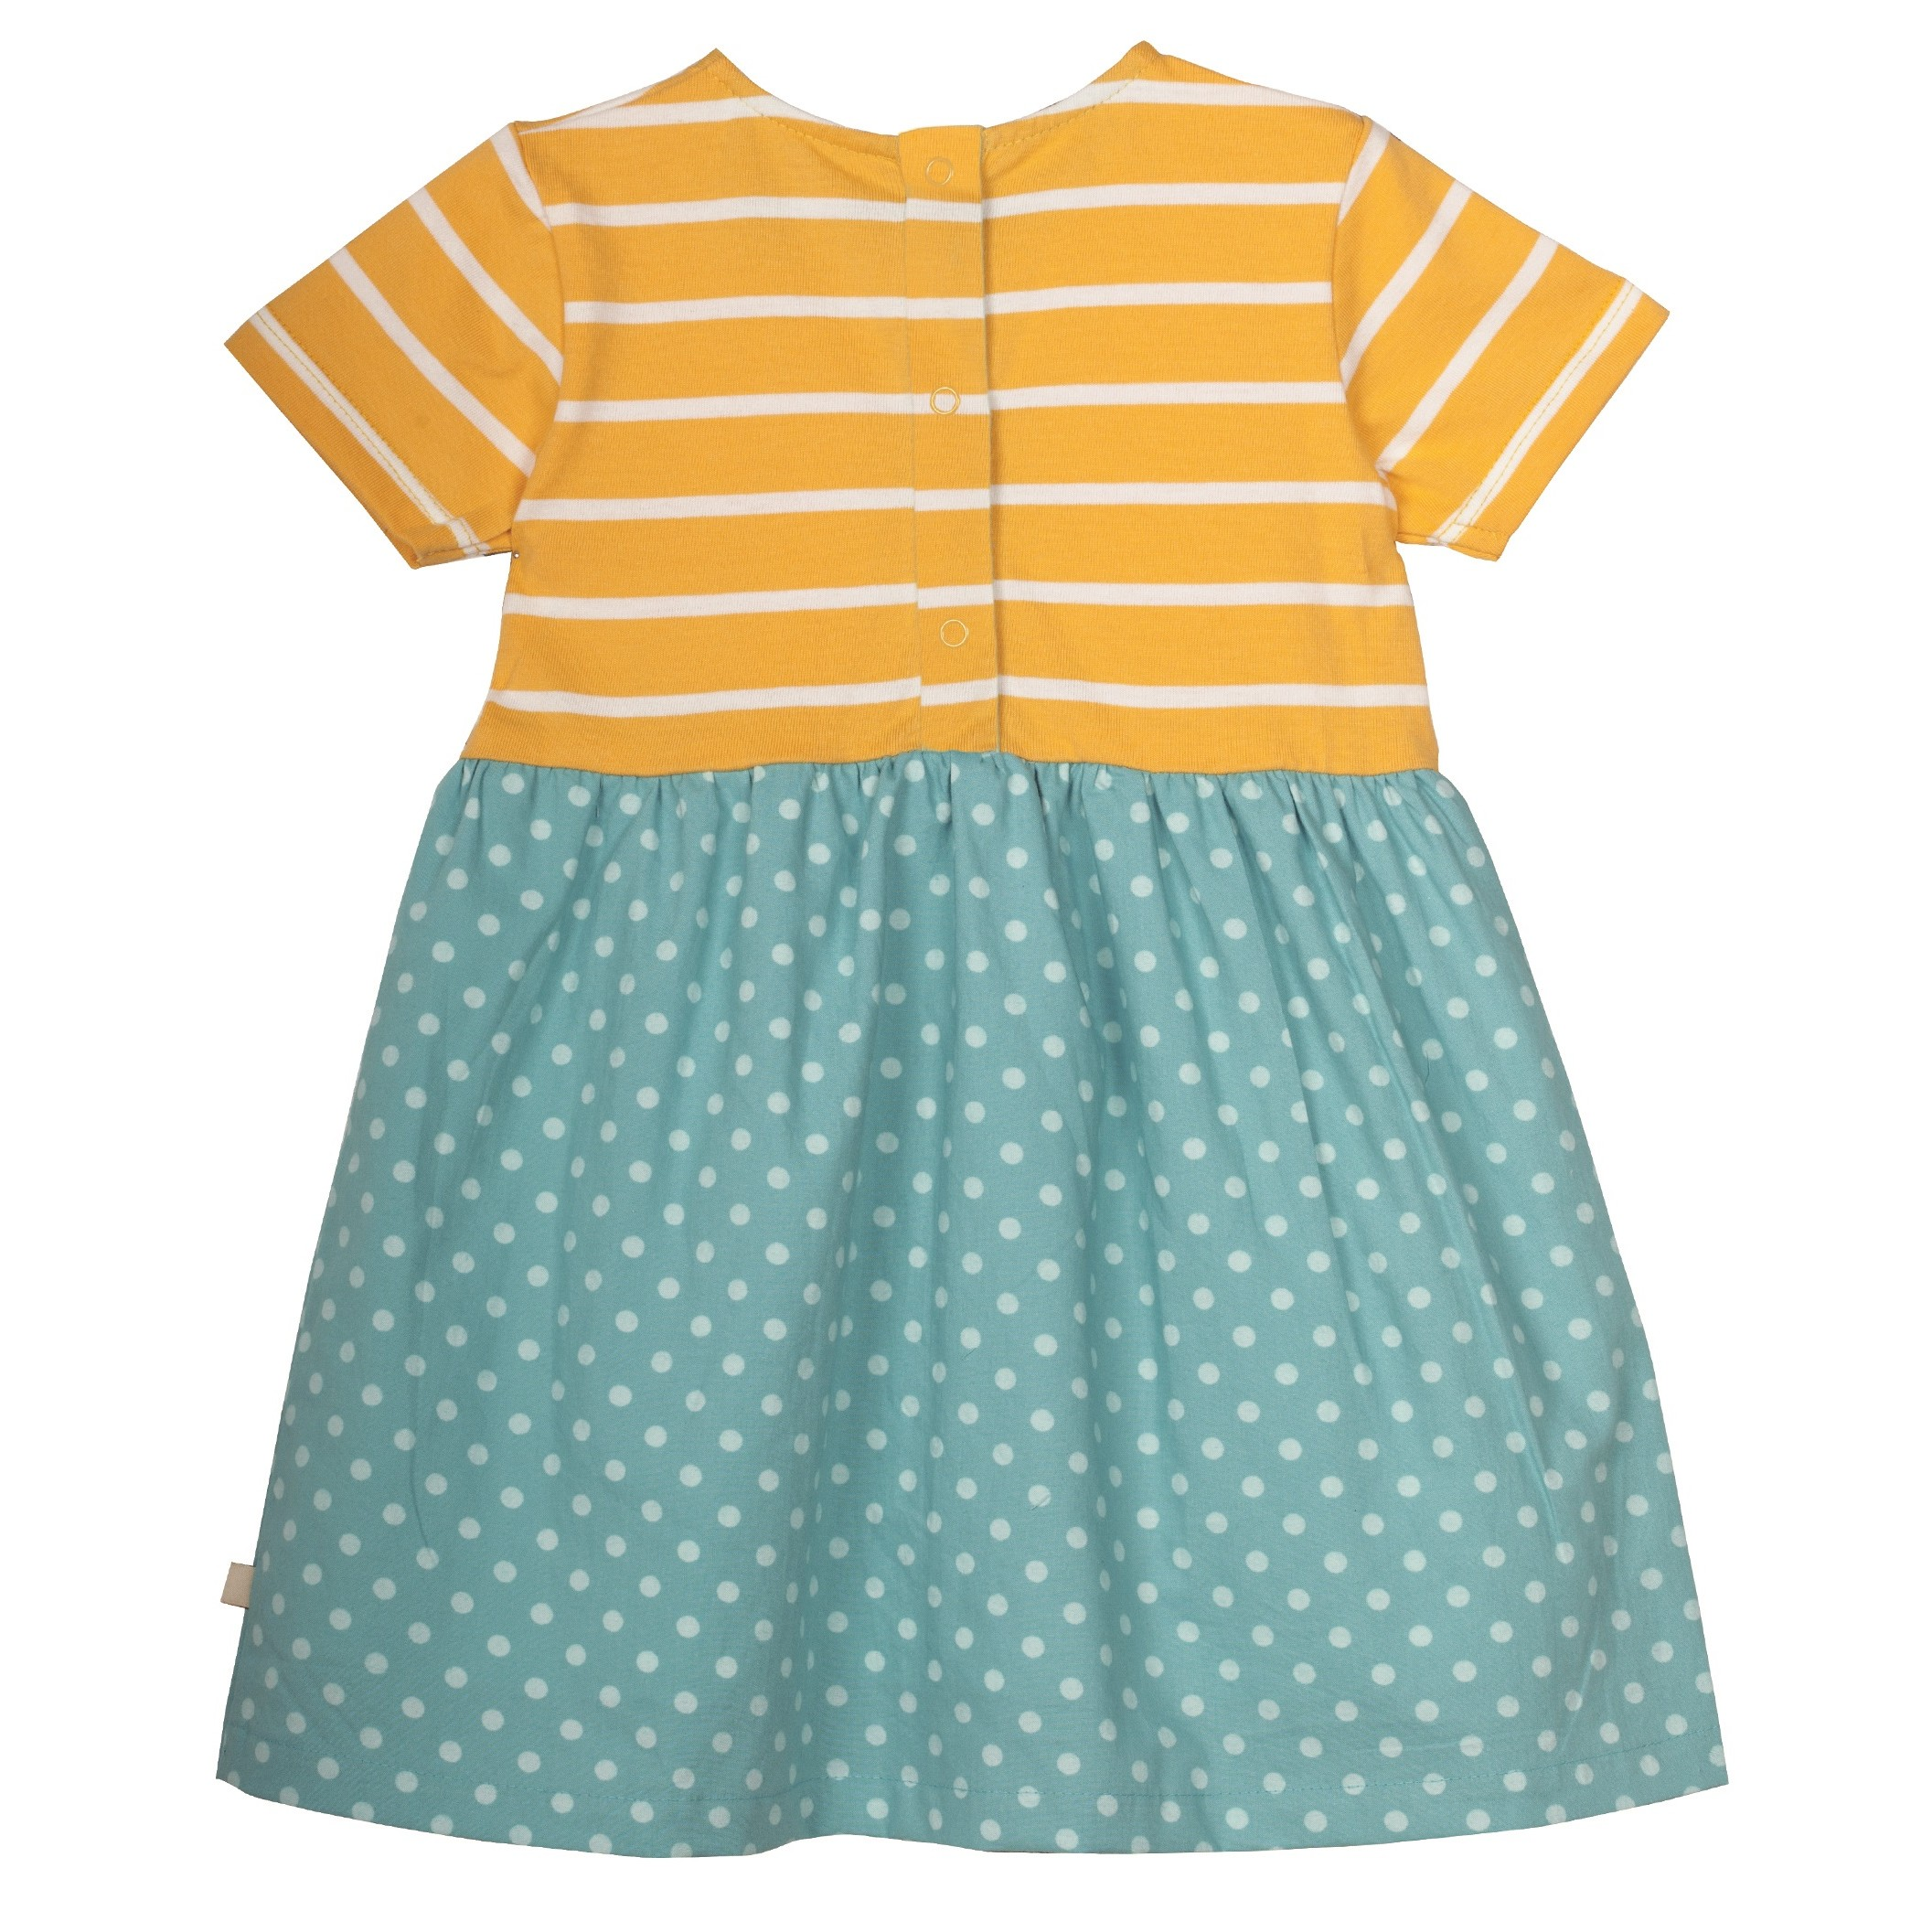 Prussia Dress – Fashion dresses